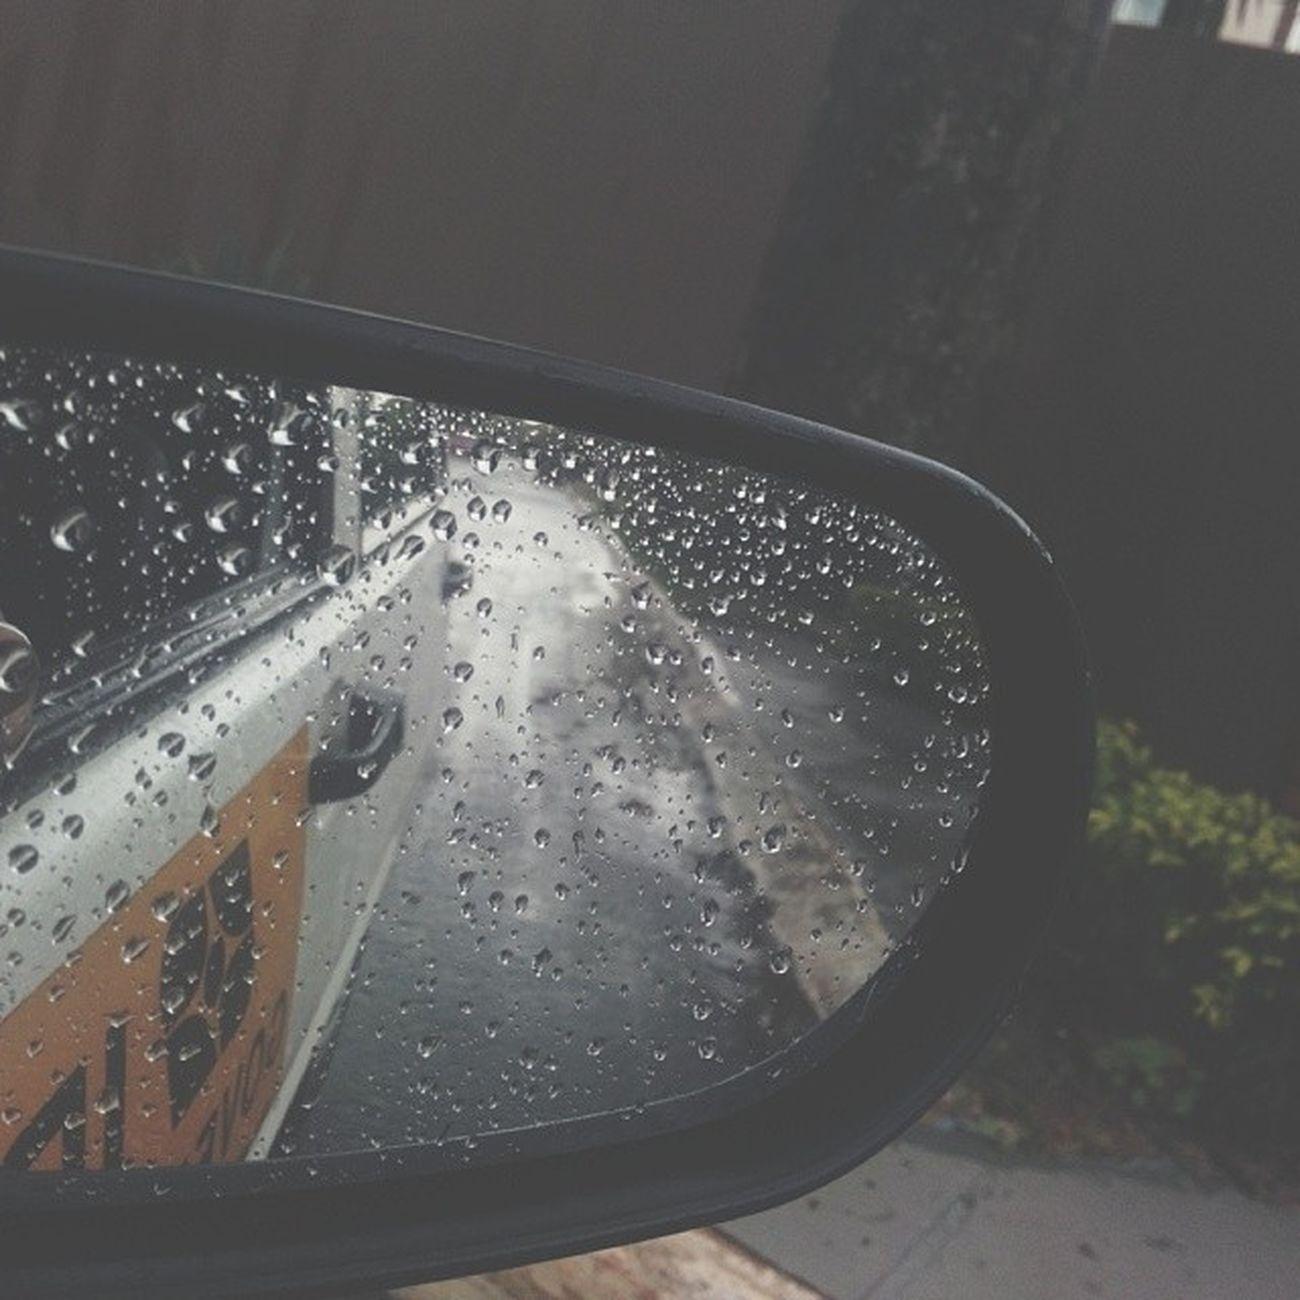 Rearviewmirror RainyDay